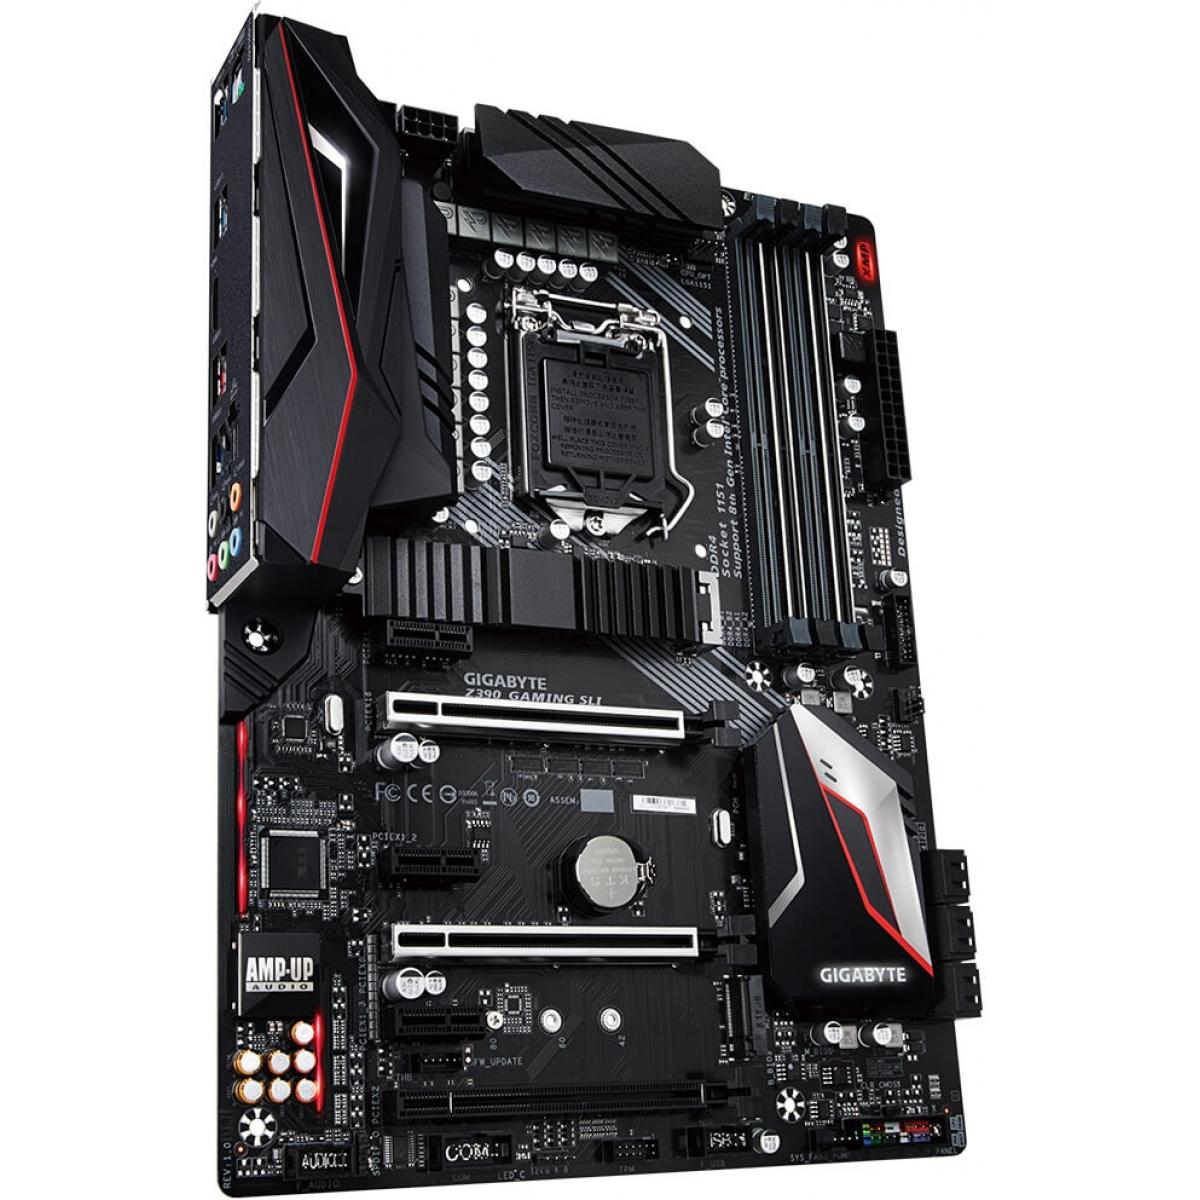 Placa Mãe Gigabyte Z390 GAMING SLI, Chipset Z390, Intel LGA 1151, ATX, DDR4